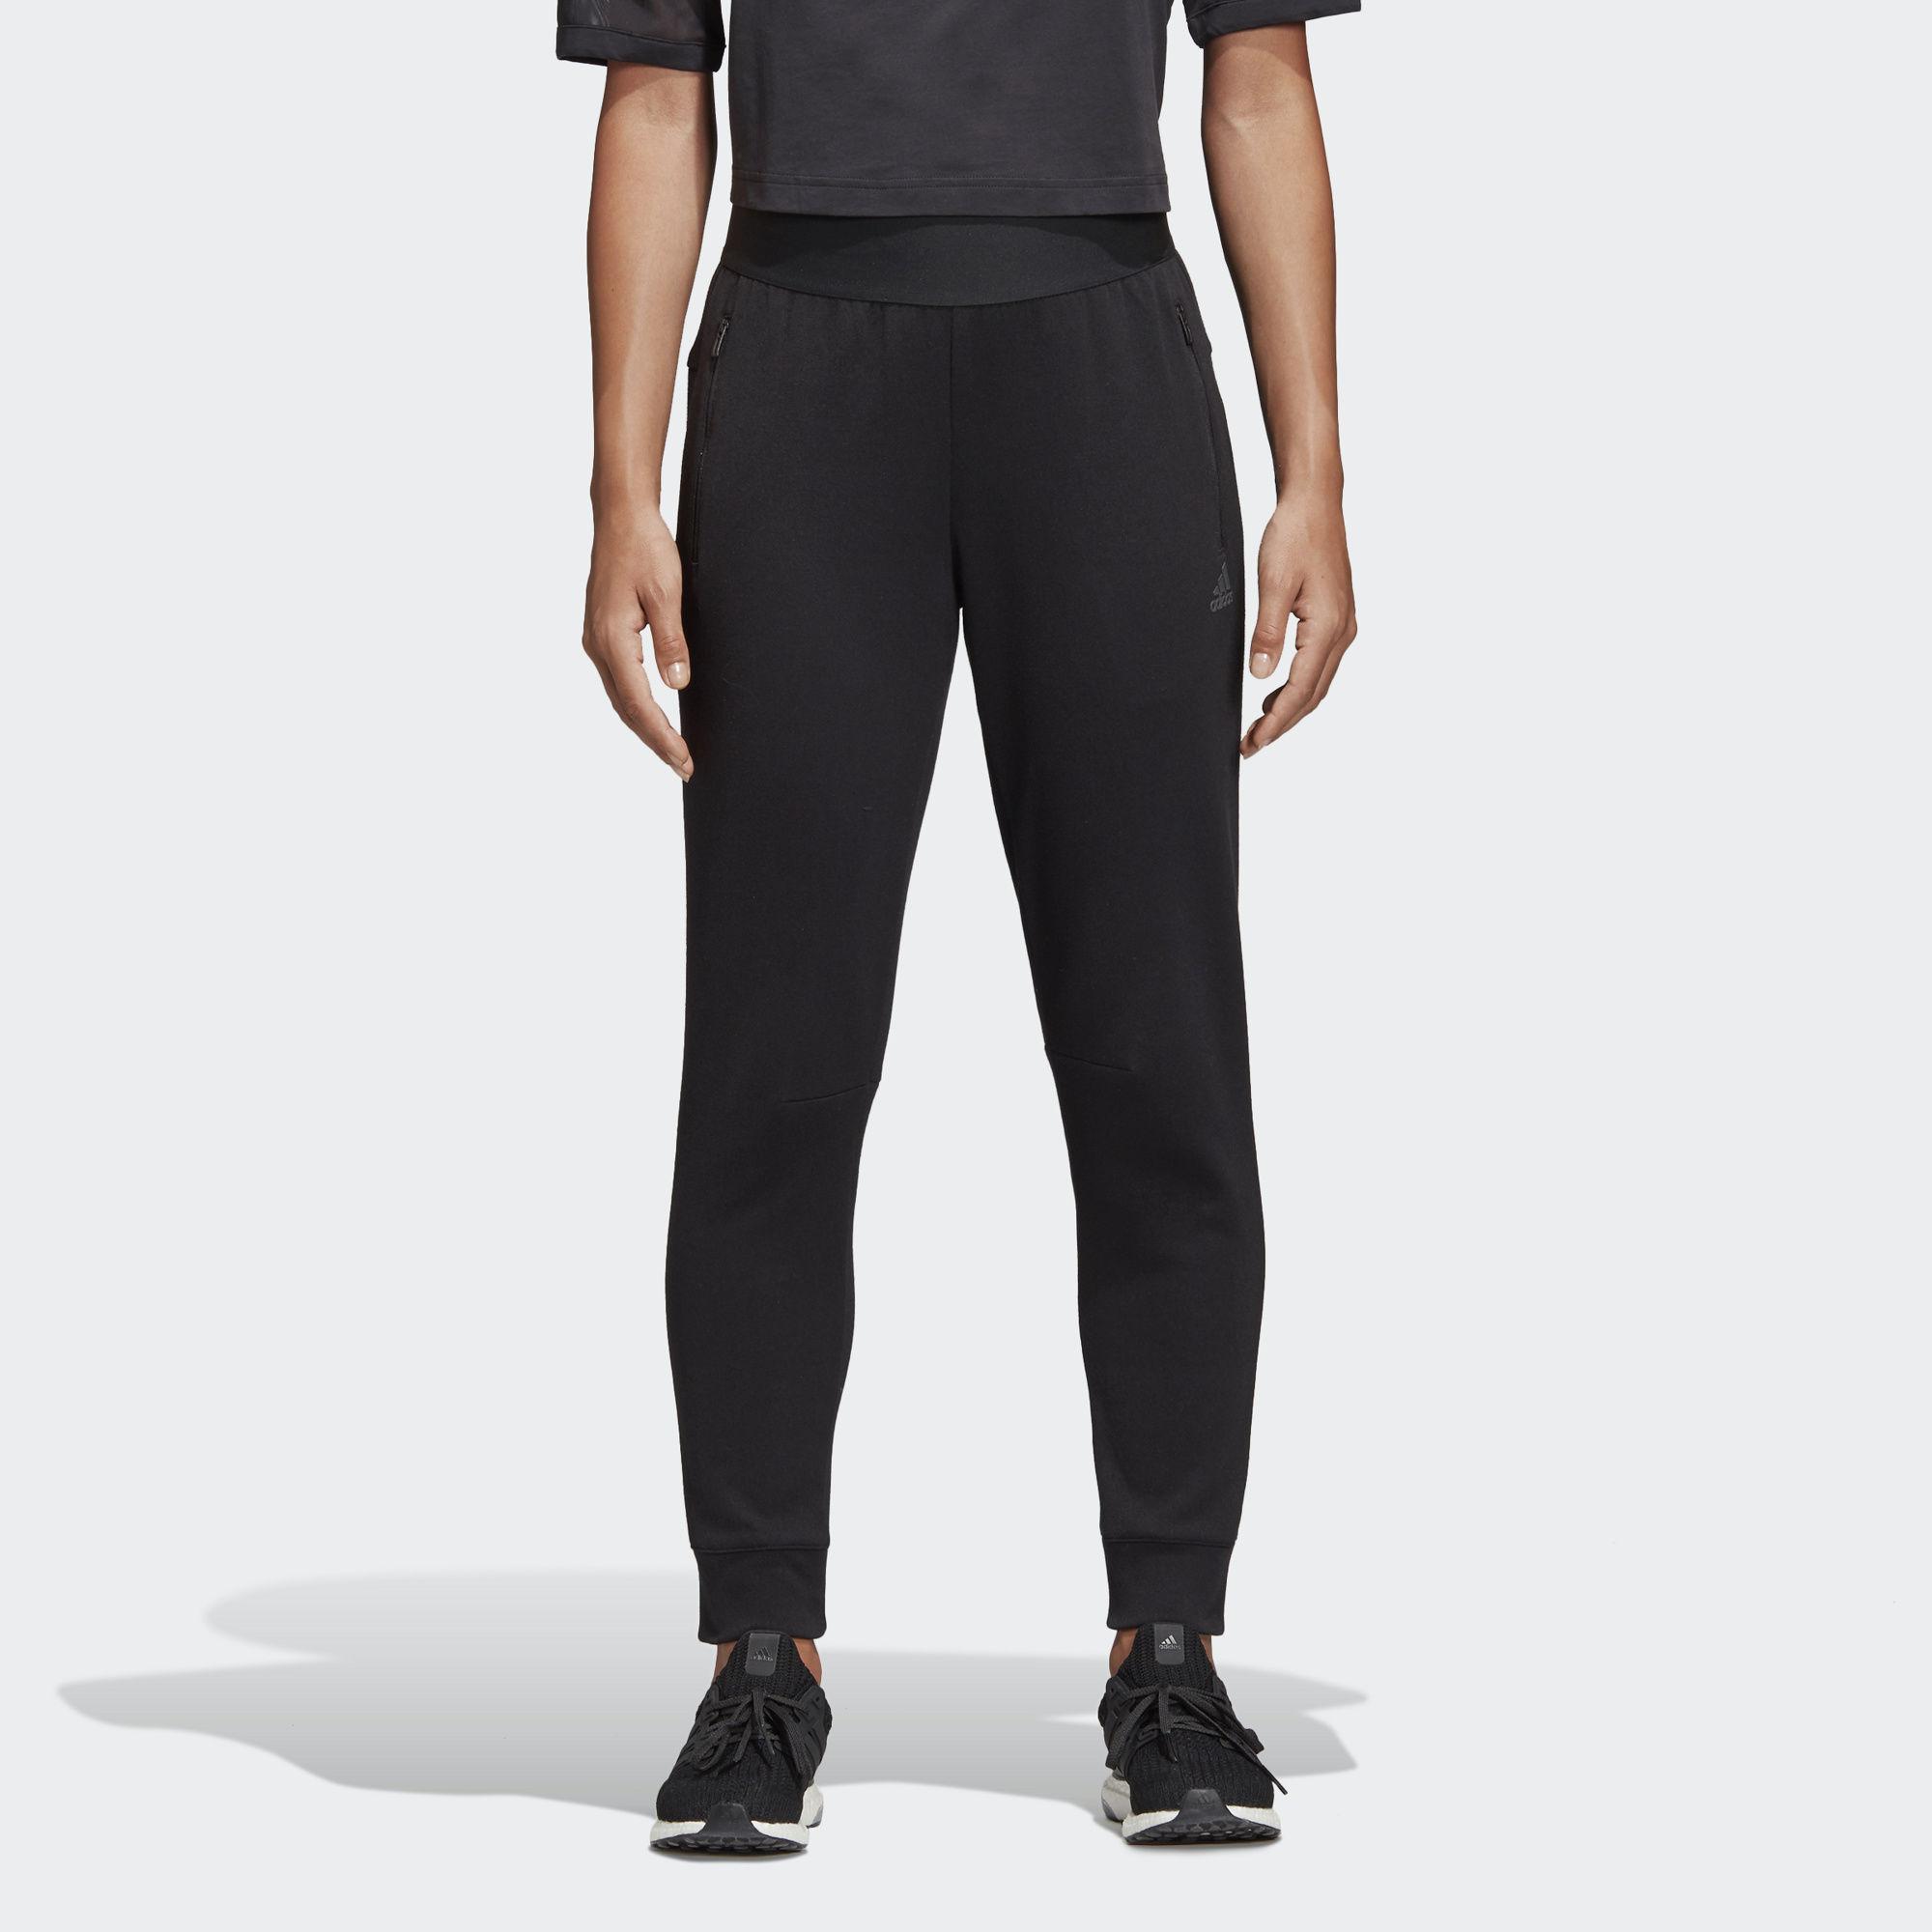 Court Vantage Outlet Originals Skor Rabattkod Dam Adidas